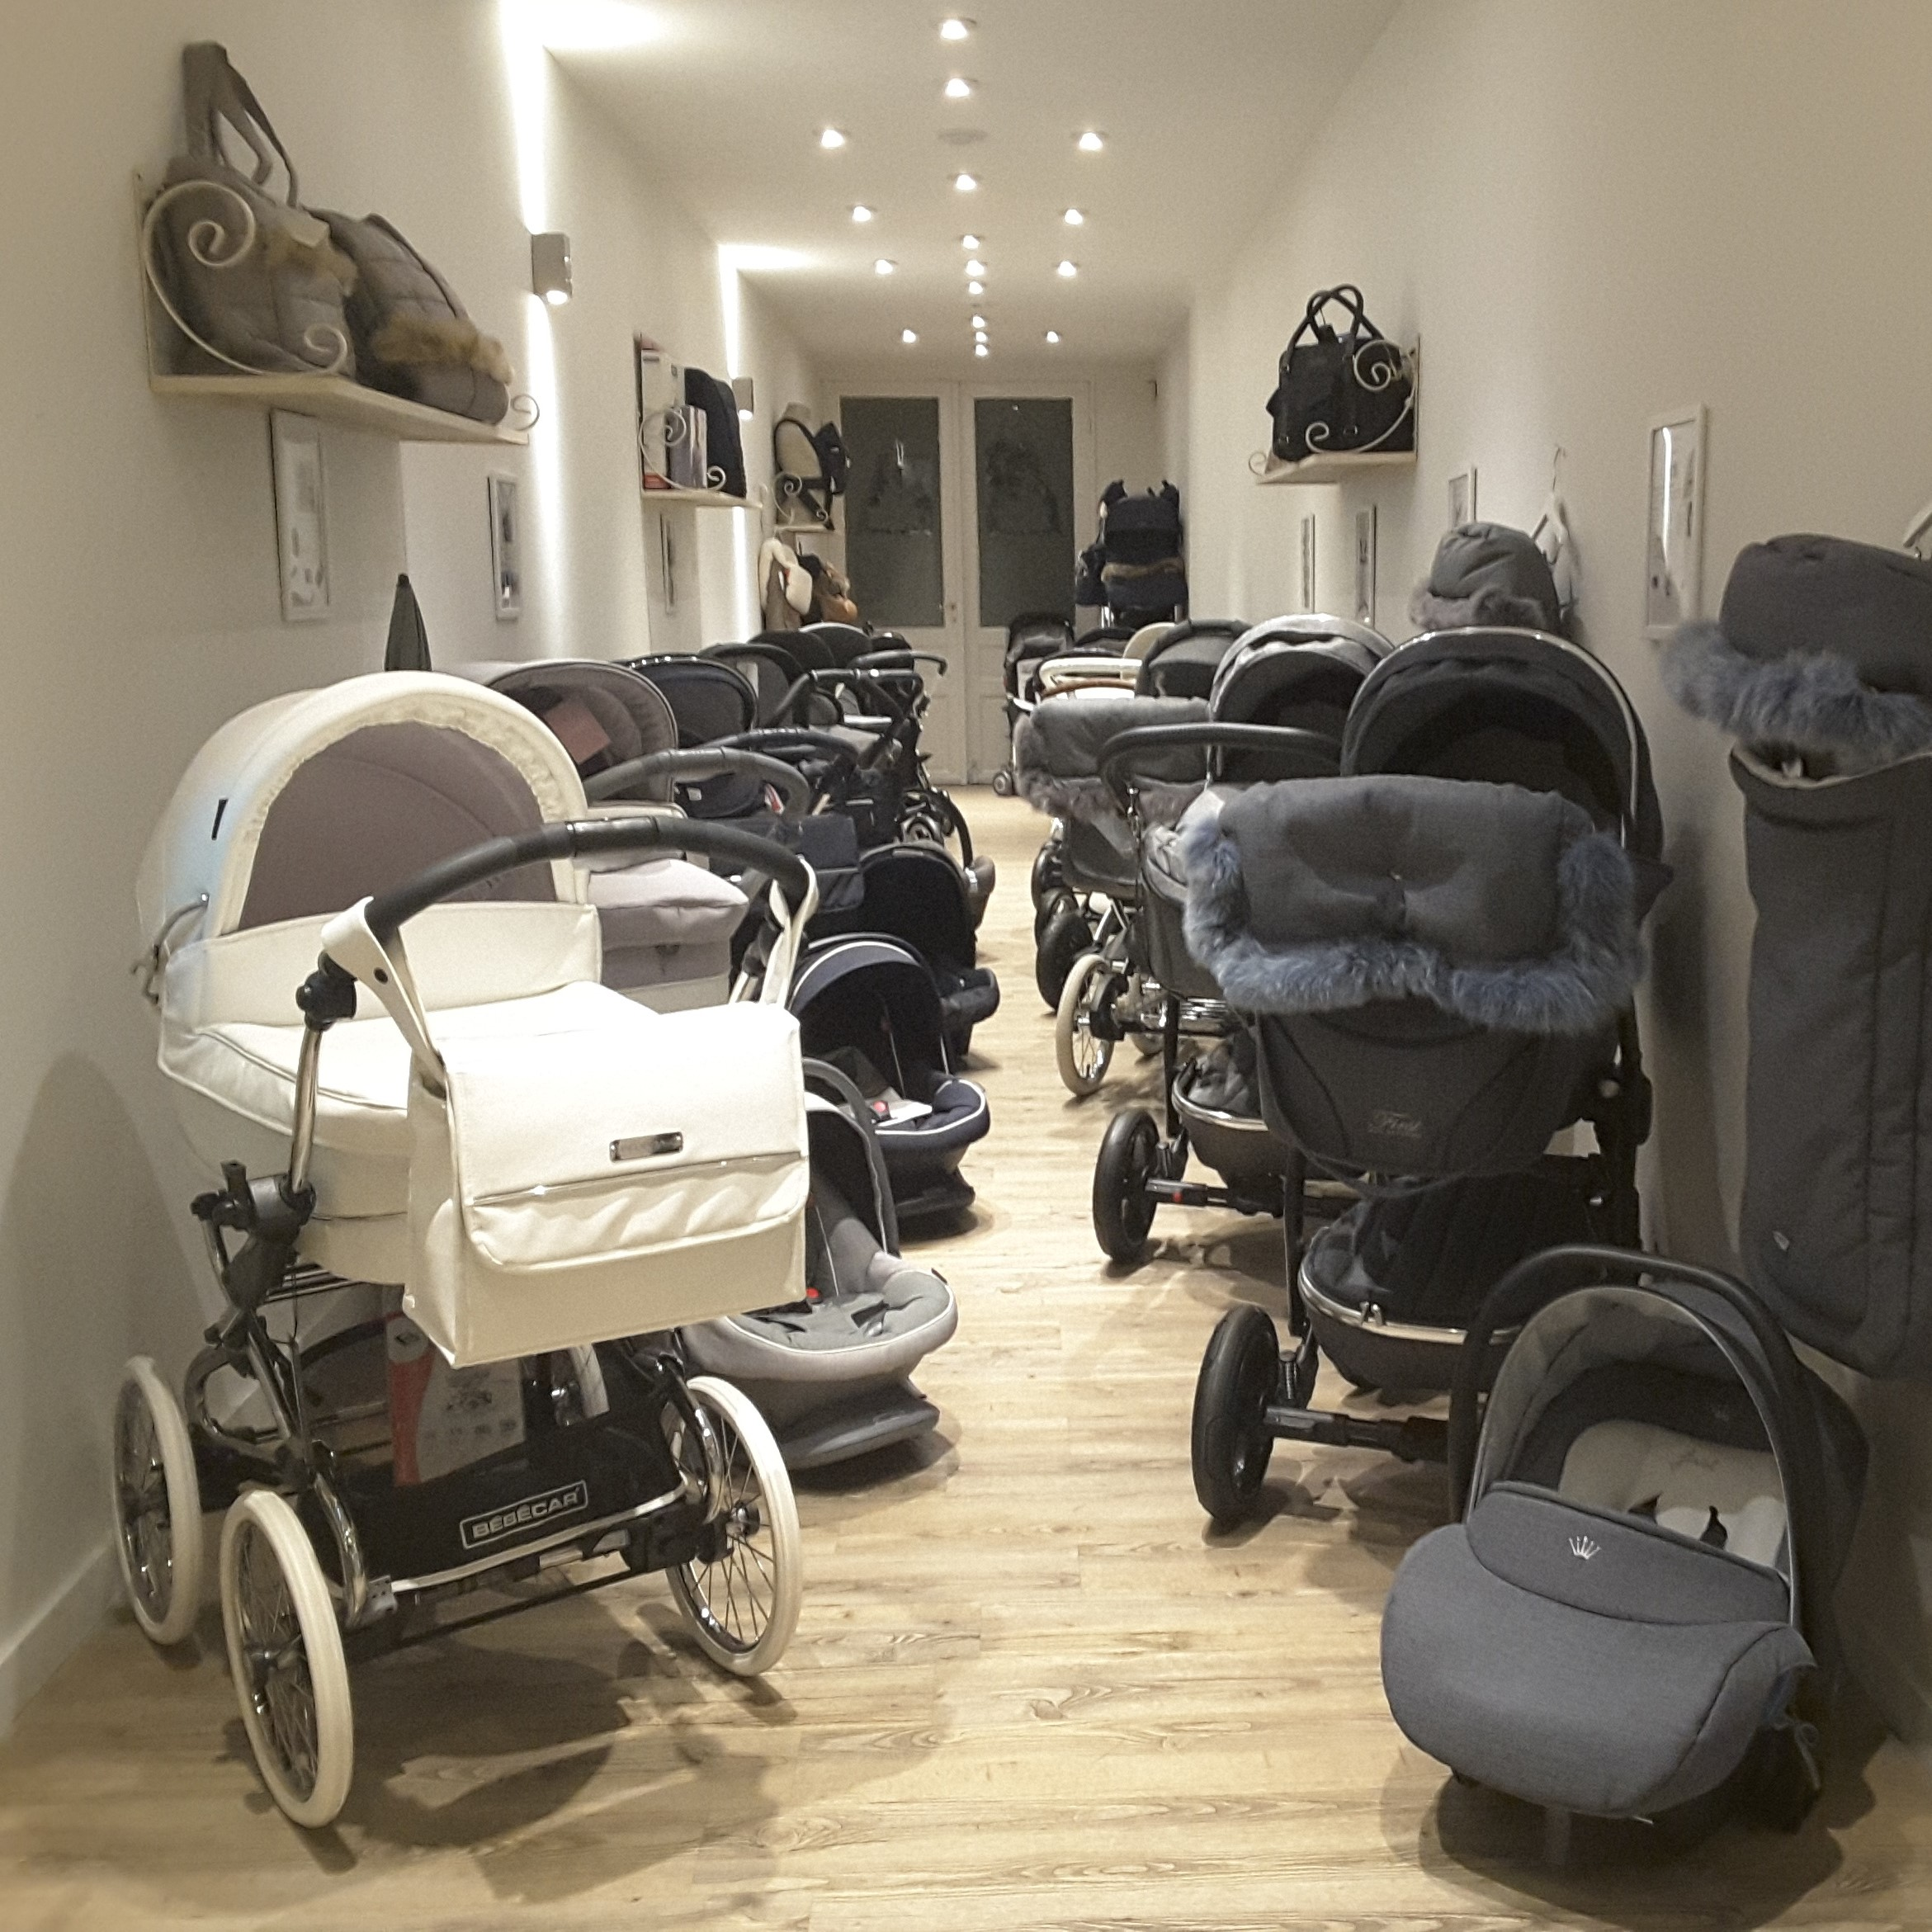 kinderwagens Baby & Co babyspeciaalzaak